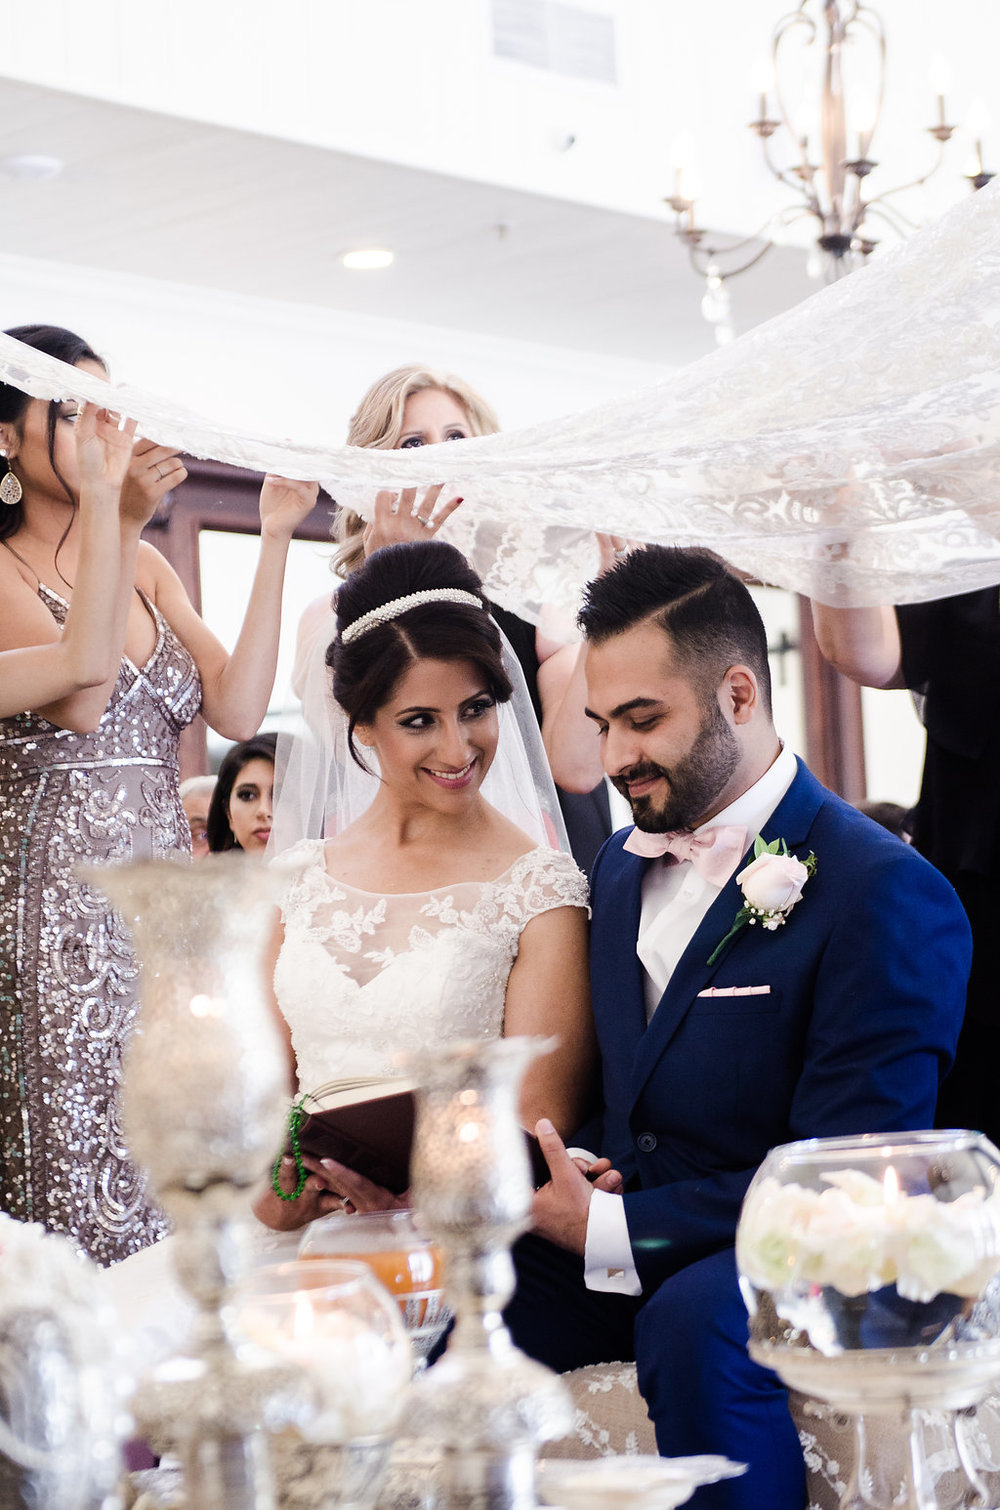 Celebrations-Wedding-Paul-Shery-Sheryl-Bale-Photography.jpg